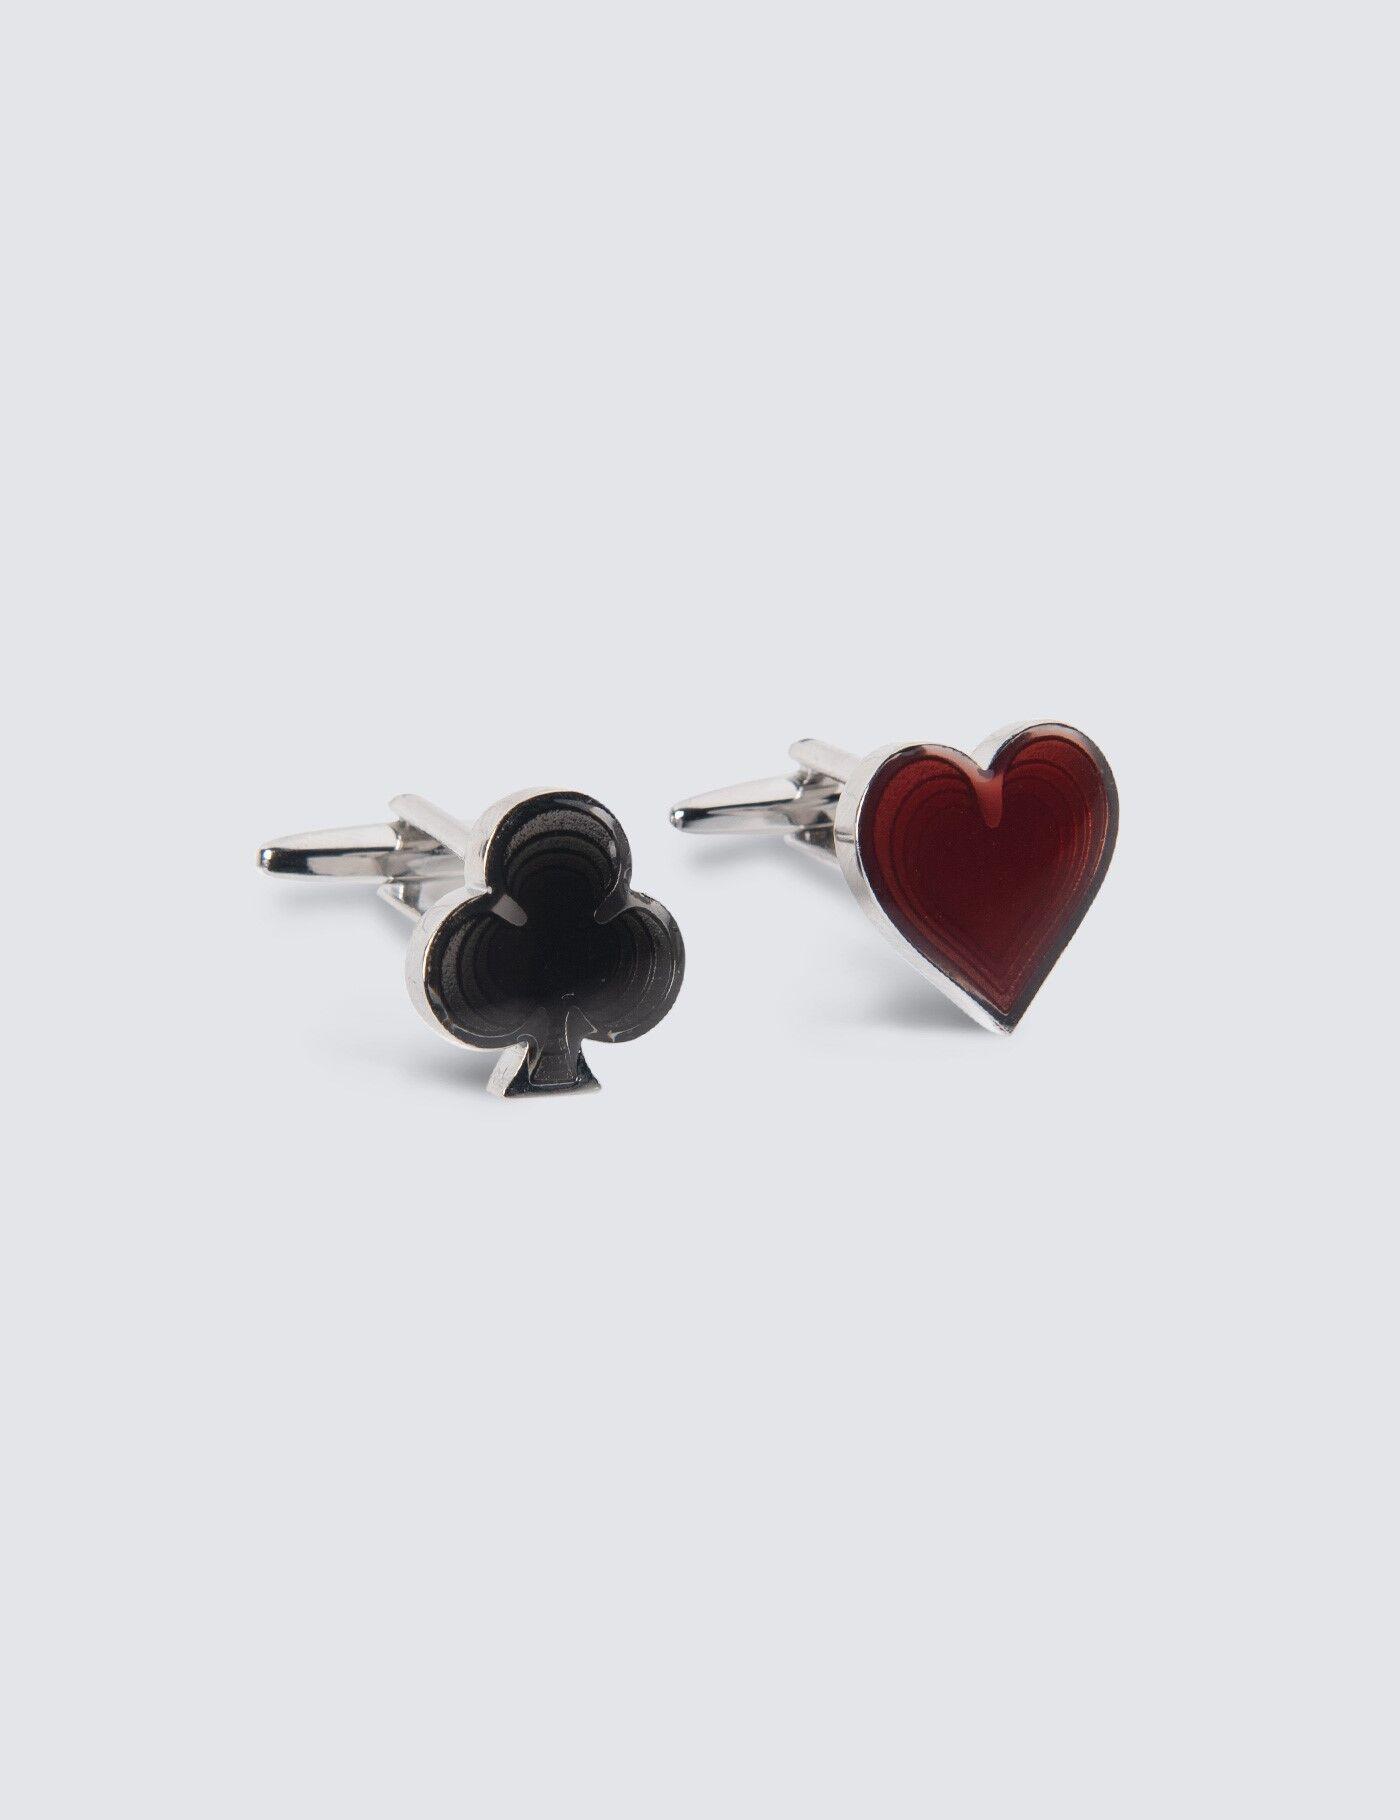 Hawes & Curtis Women's Spade & Heart Cufflinks in Black/Red